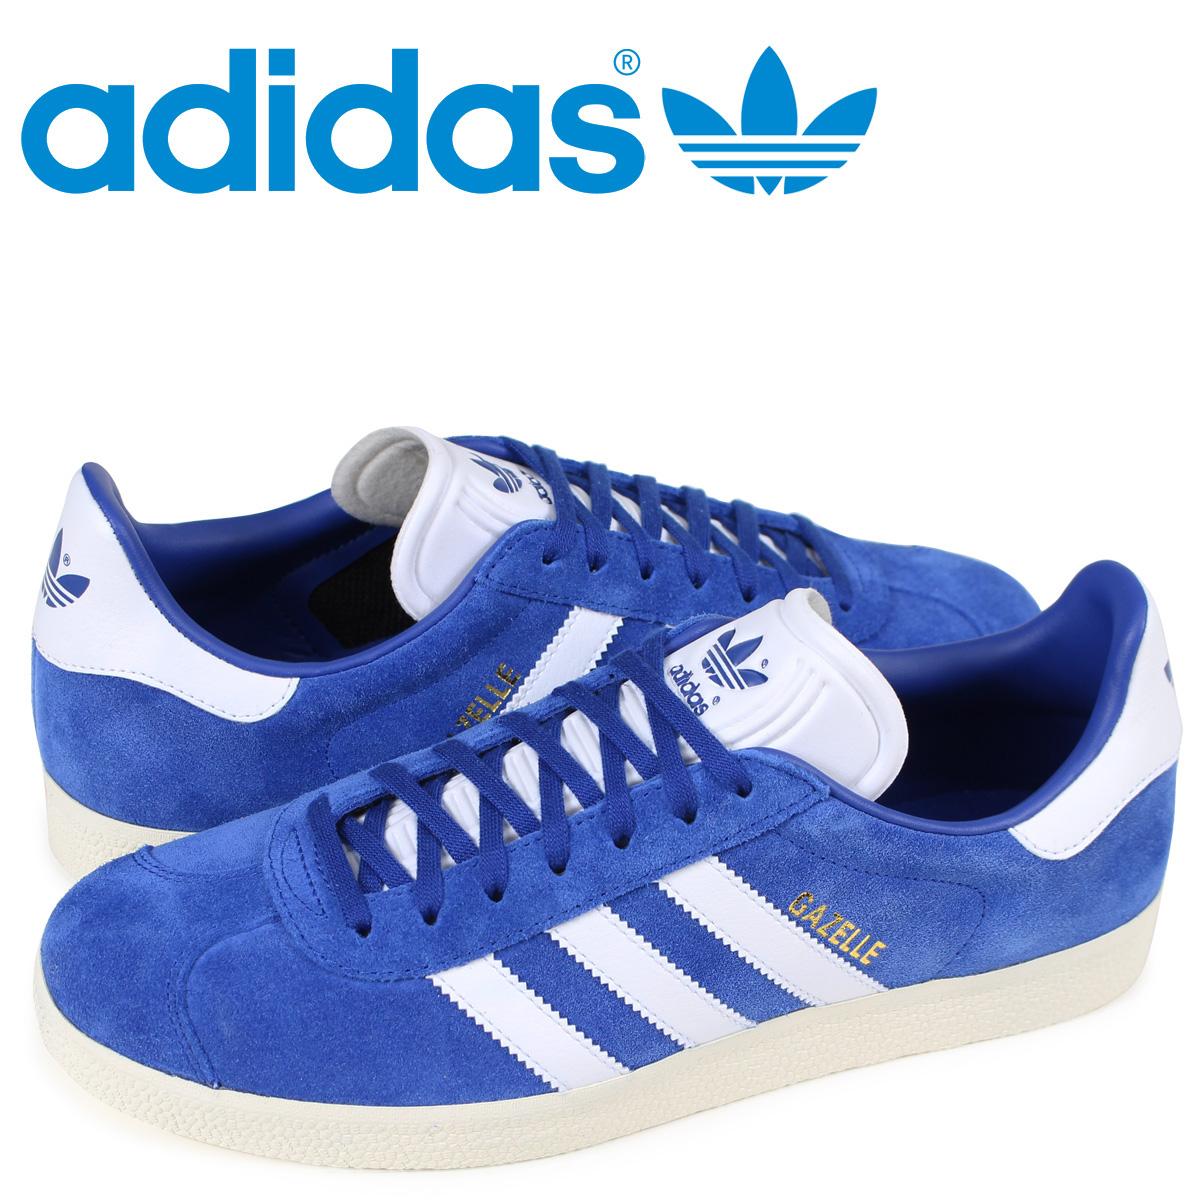 adidas gazelles mens blue